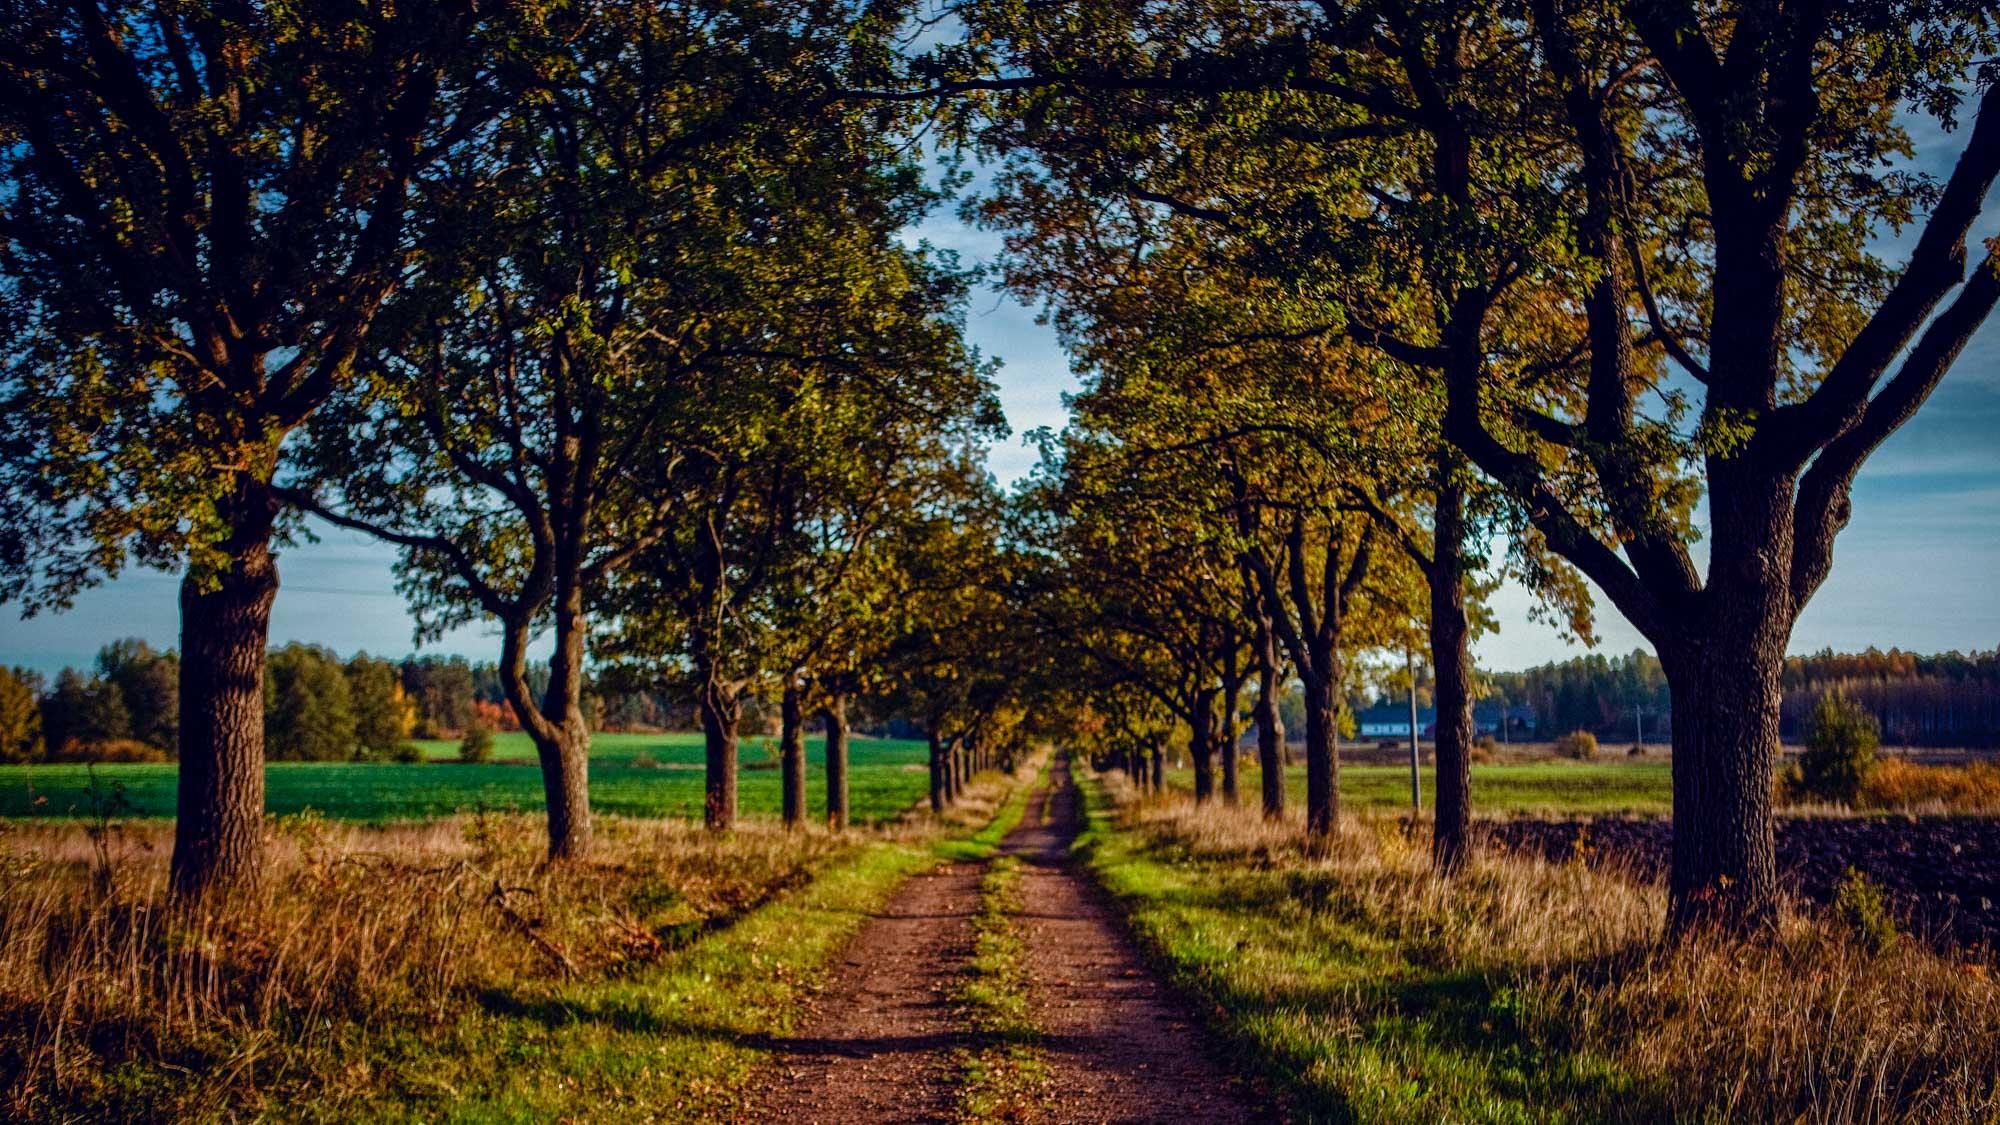 Finnland Urlaub - Kotka Landschaft - E Bike Reise